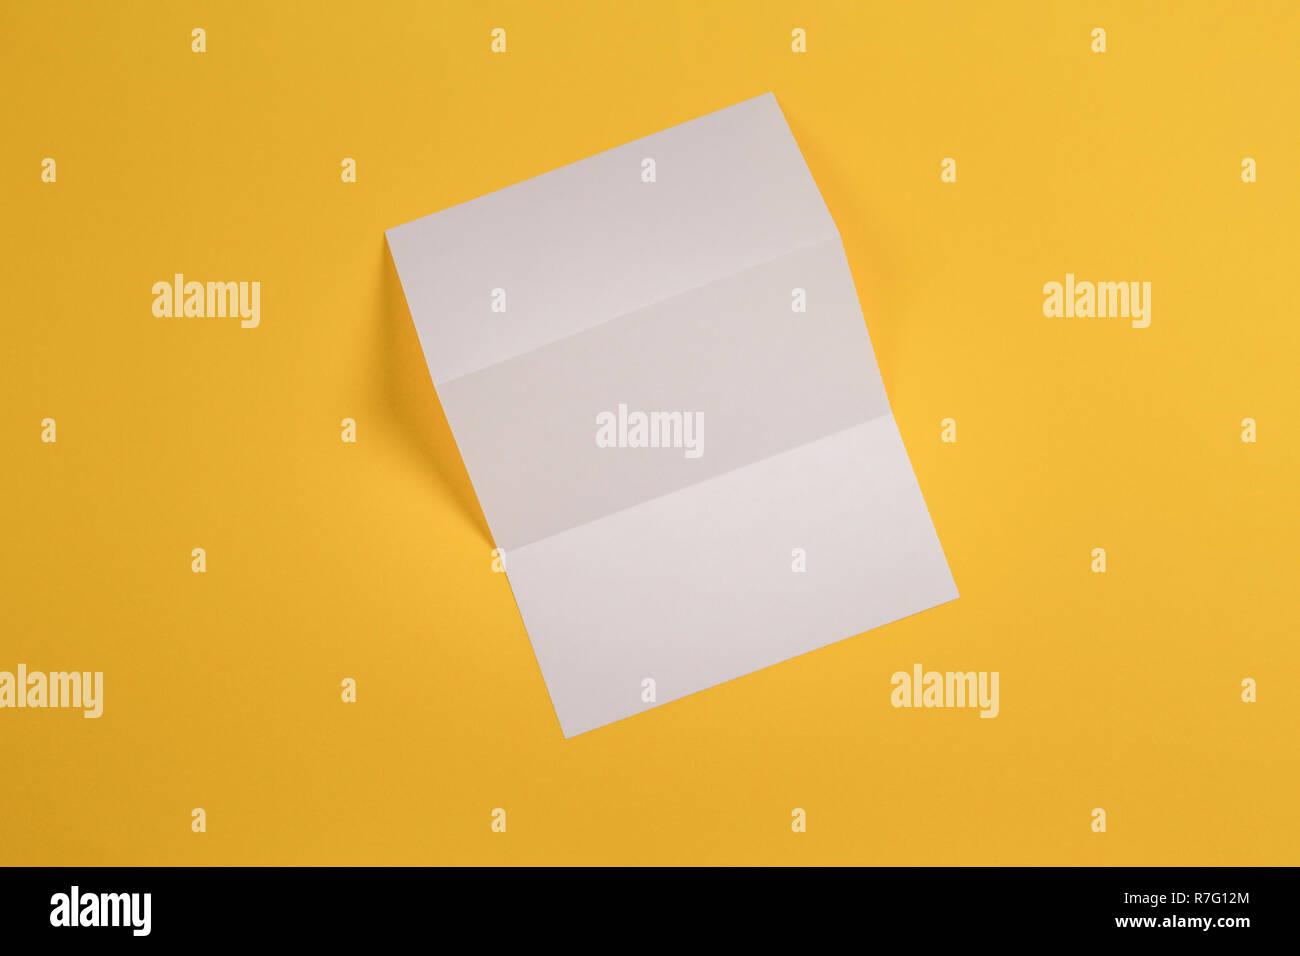 Maquette de blank white tri fold brochure brochure sur fond jaune Photo Stock